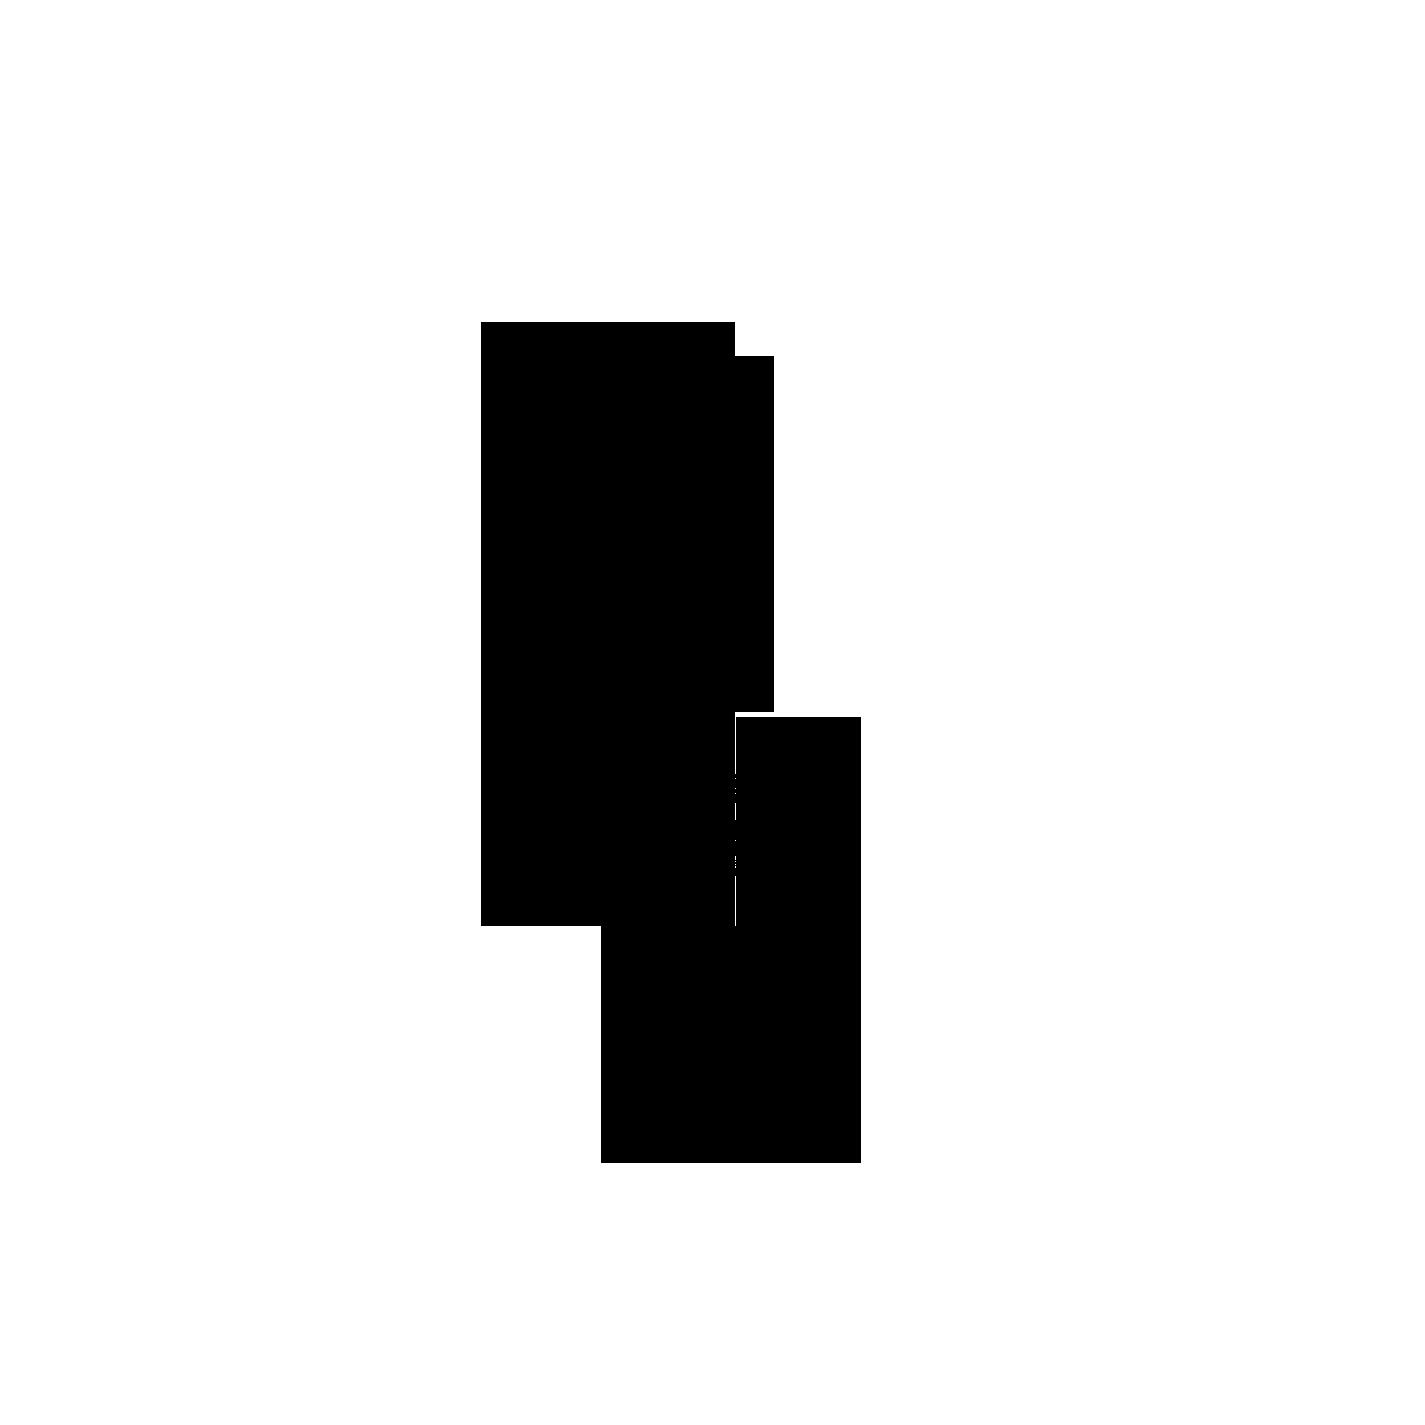 ilustra1.png